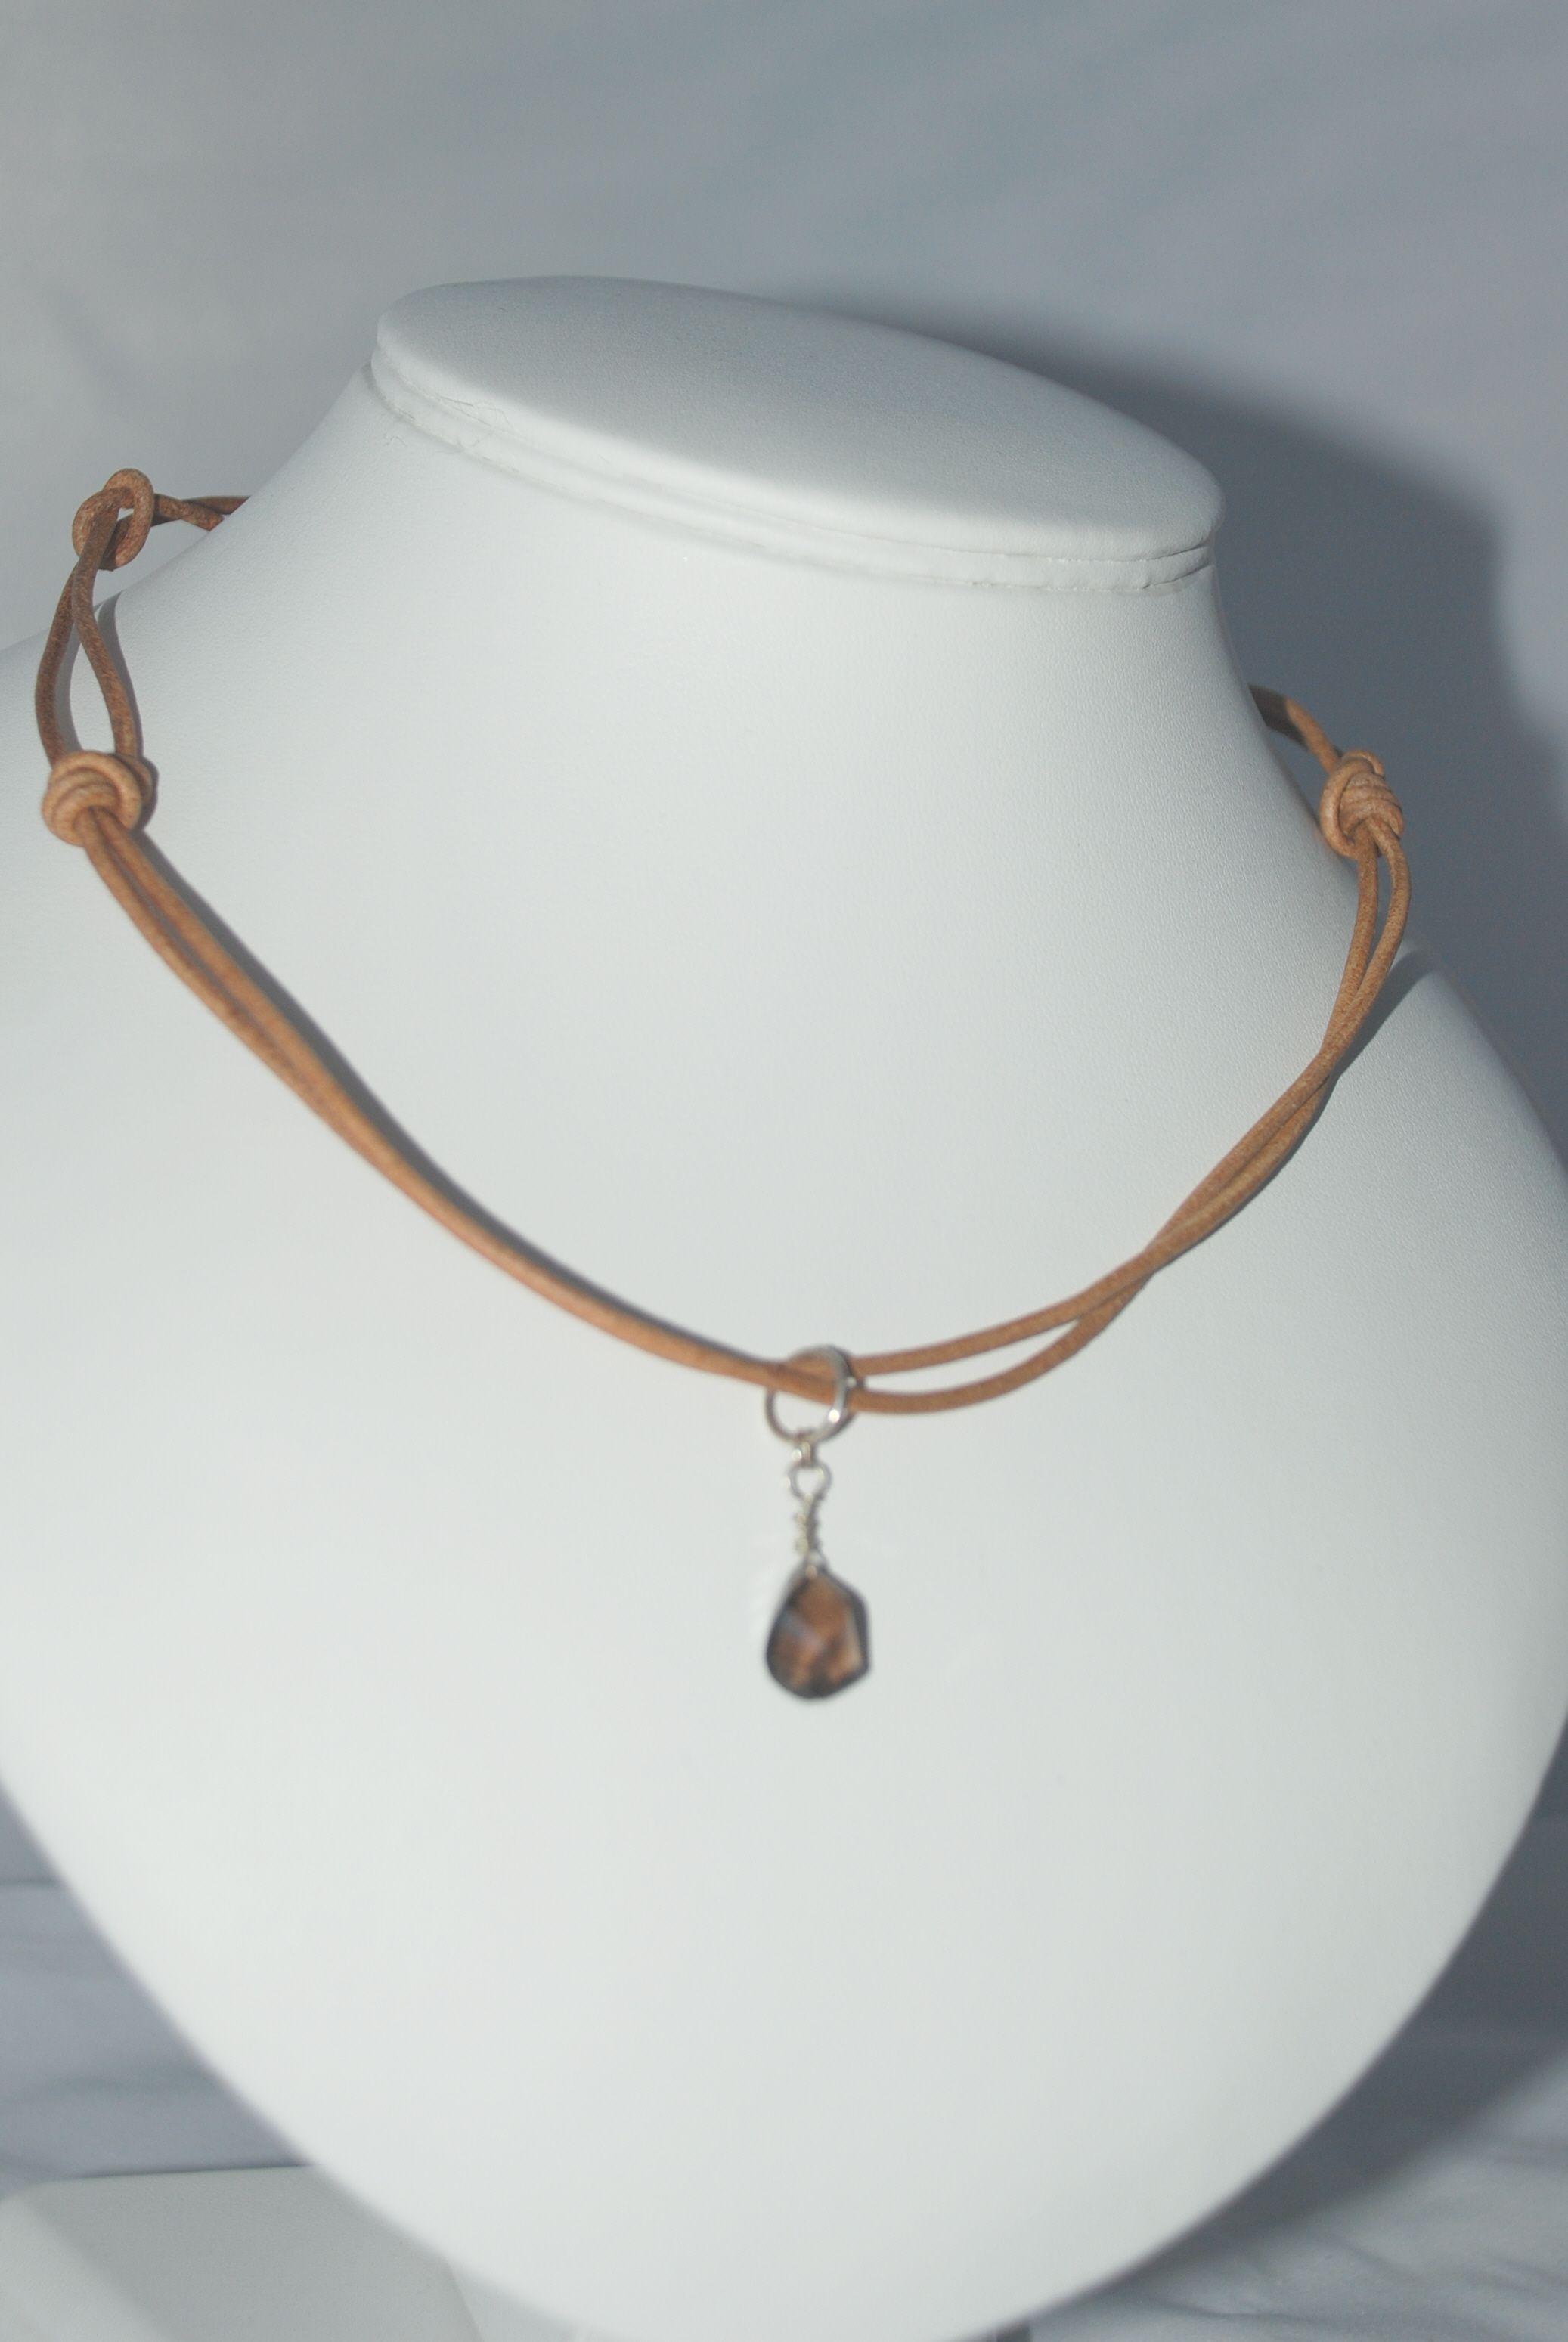 brown leather chokerette with spiral cut smoky quartz charm pendant